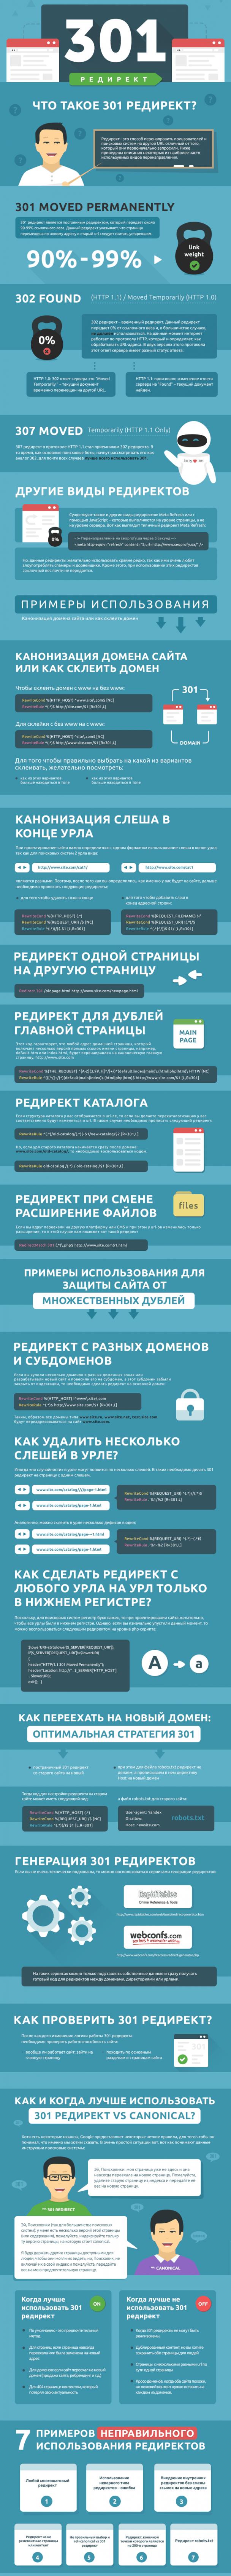 301 редирект - Инфографика